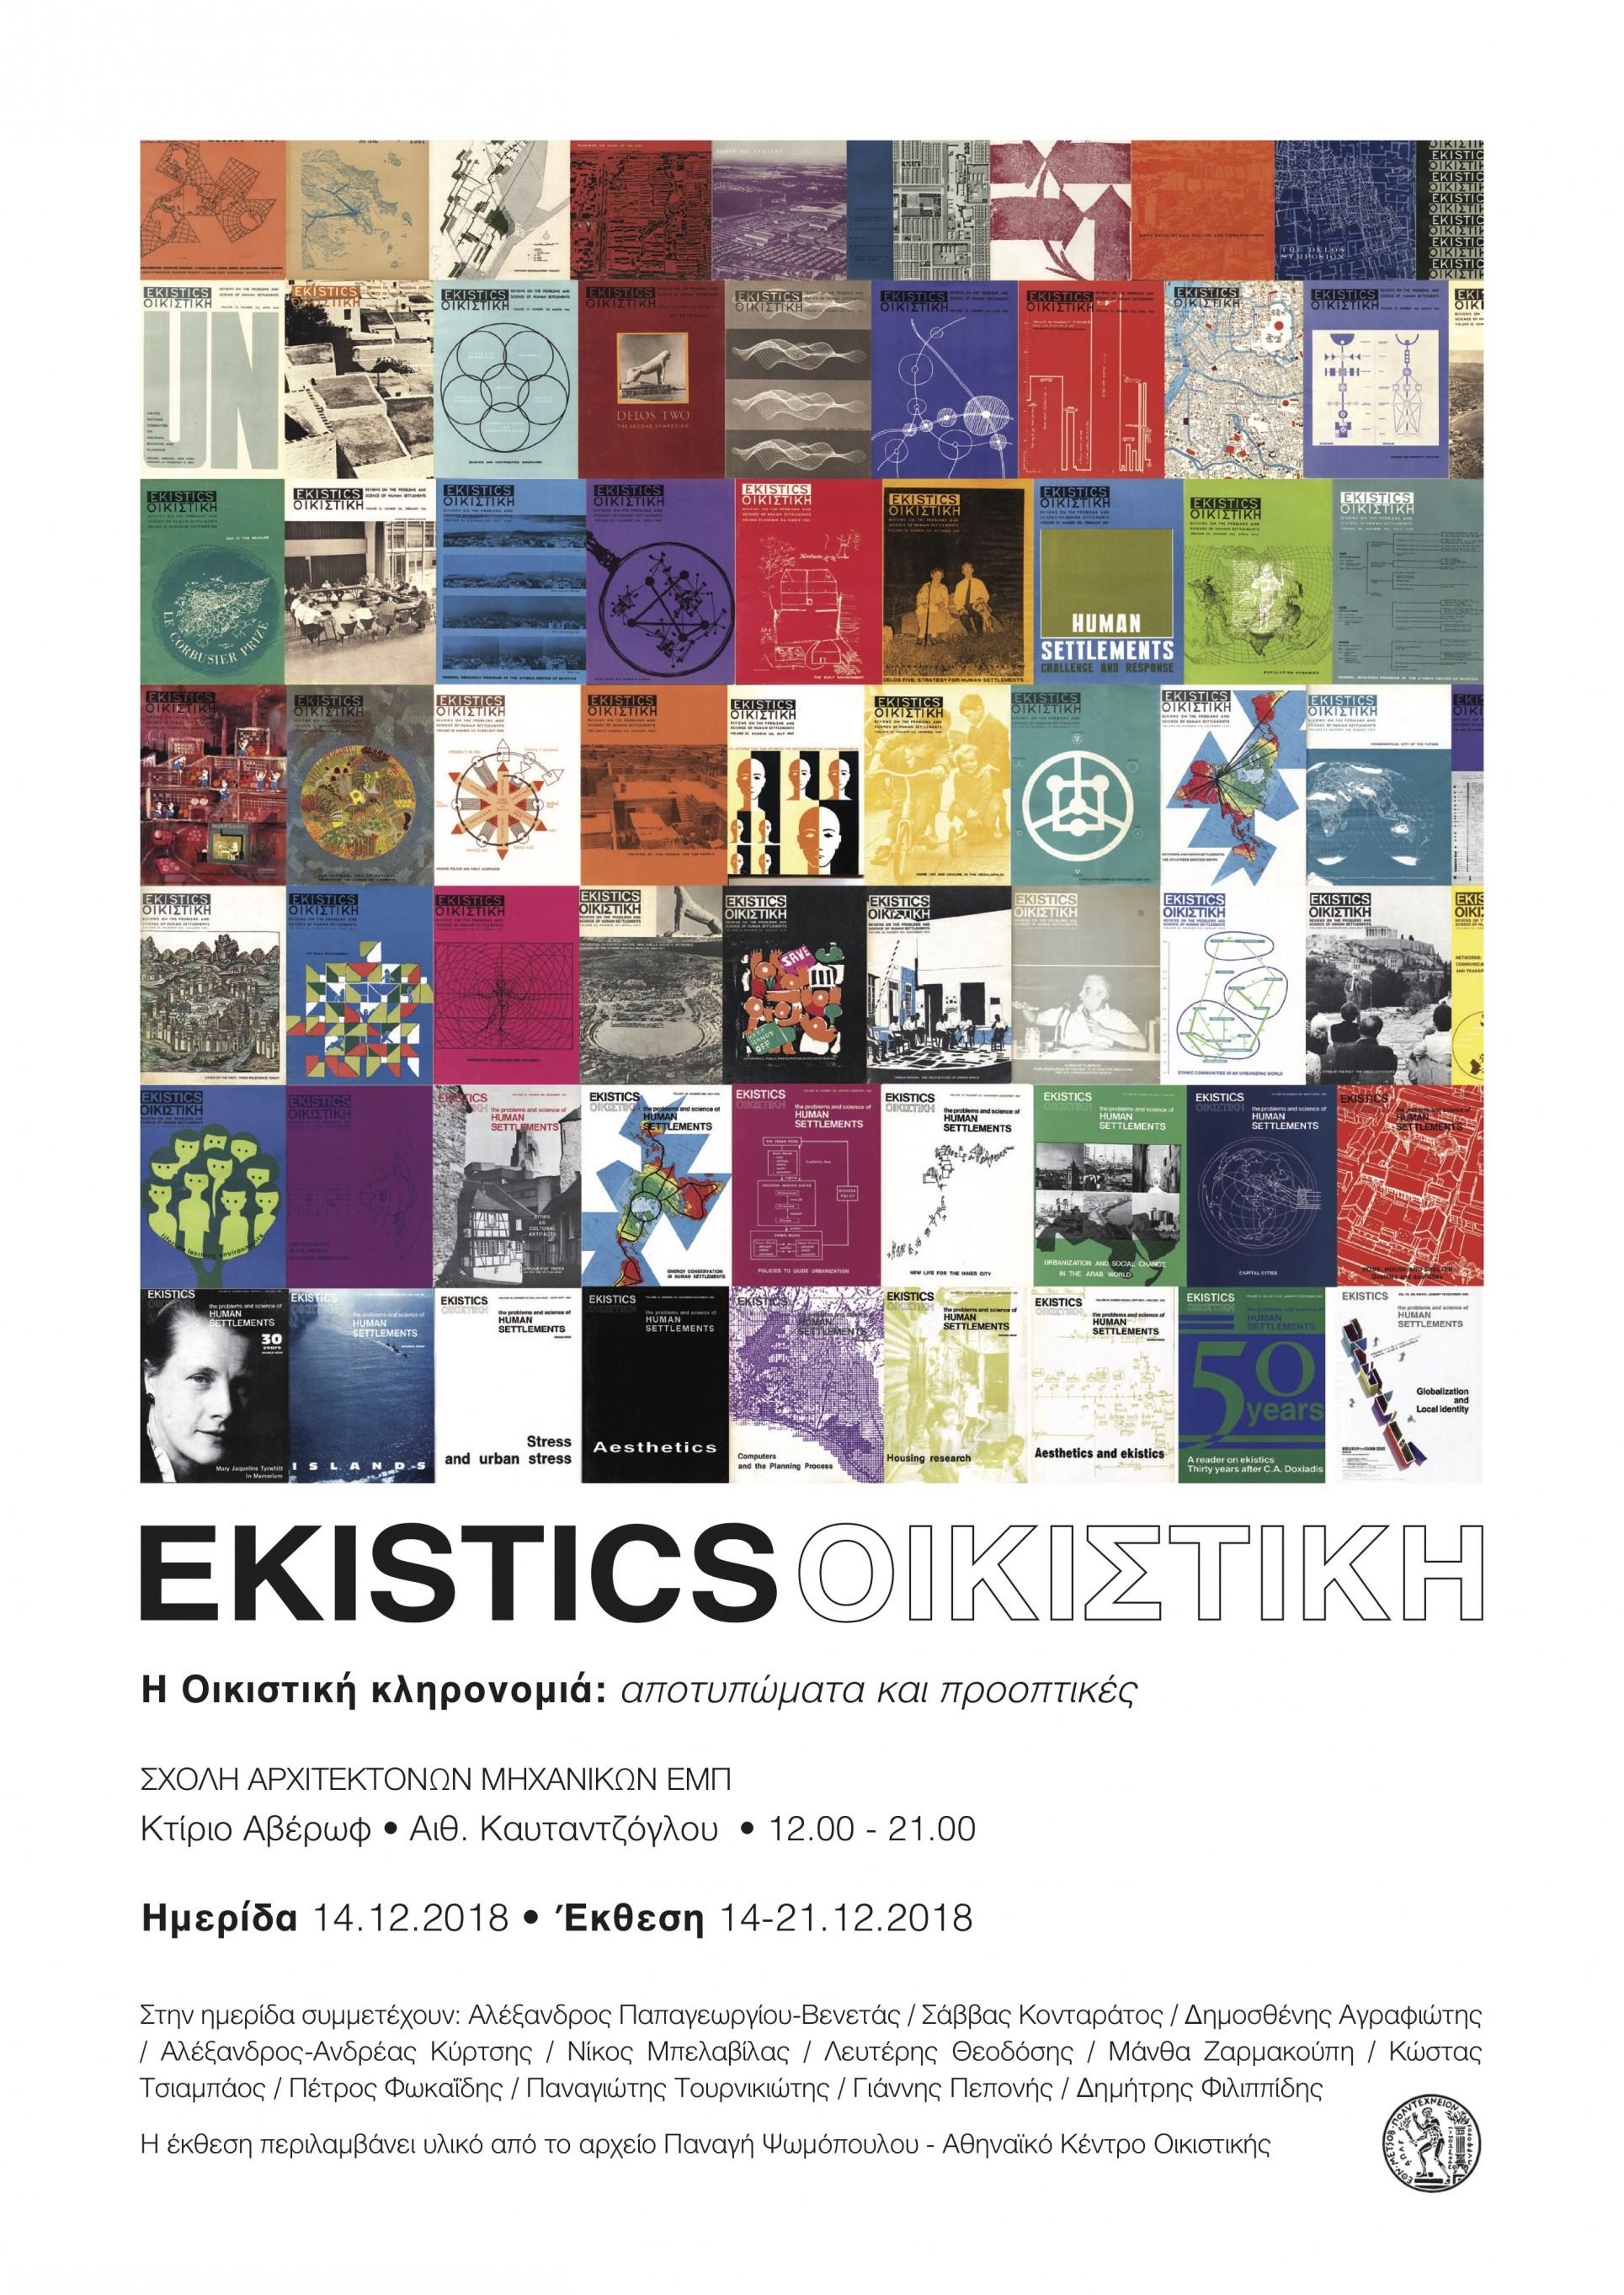 20181206_EKISTICS_poster